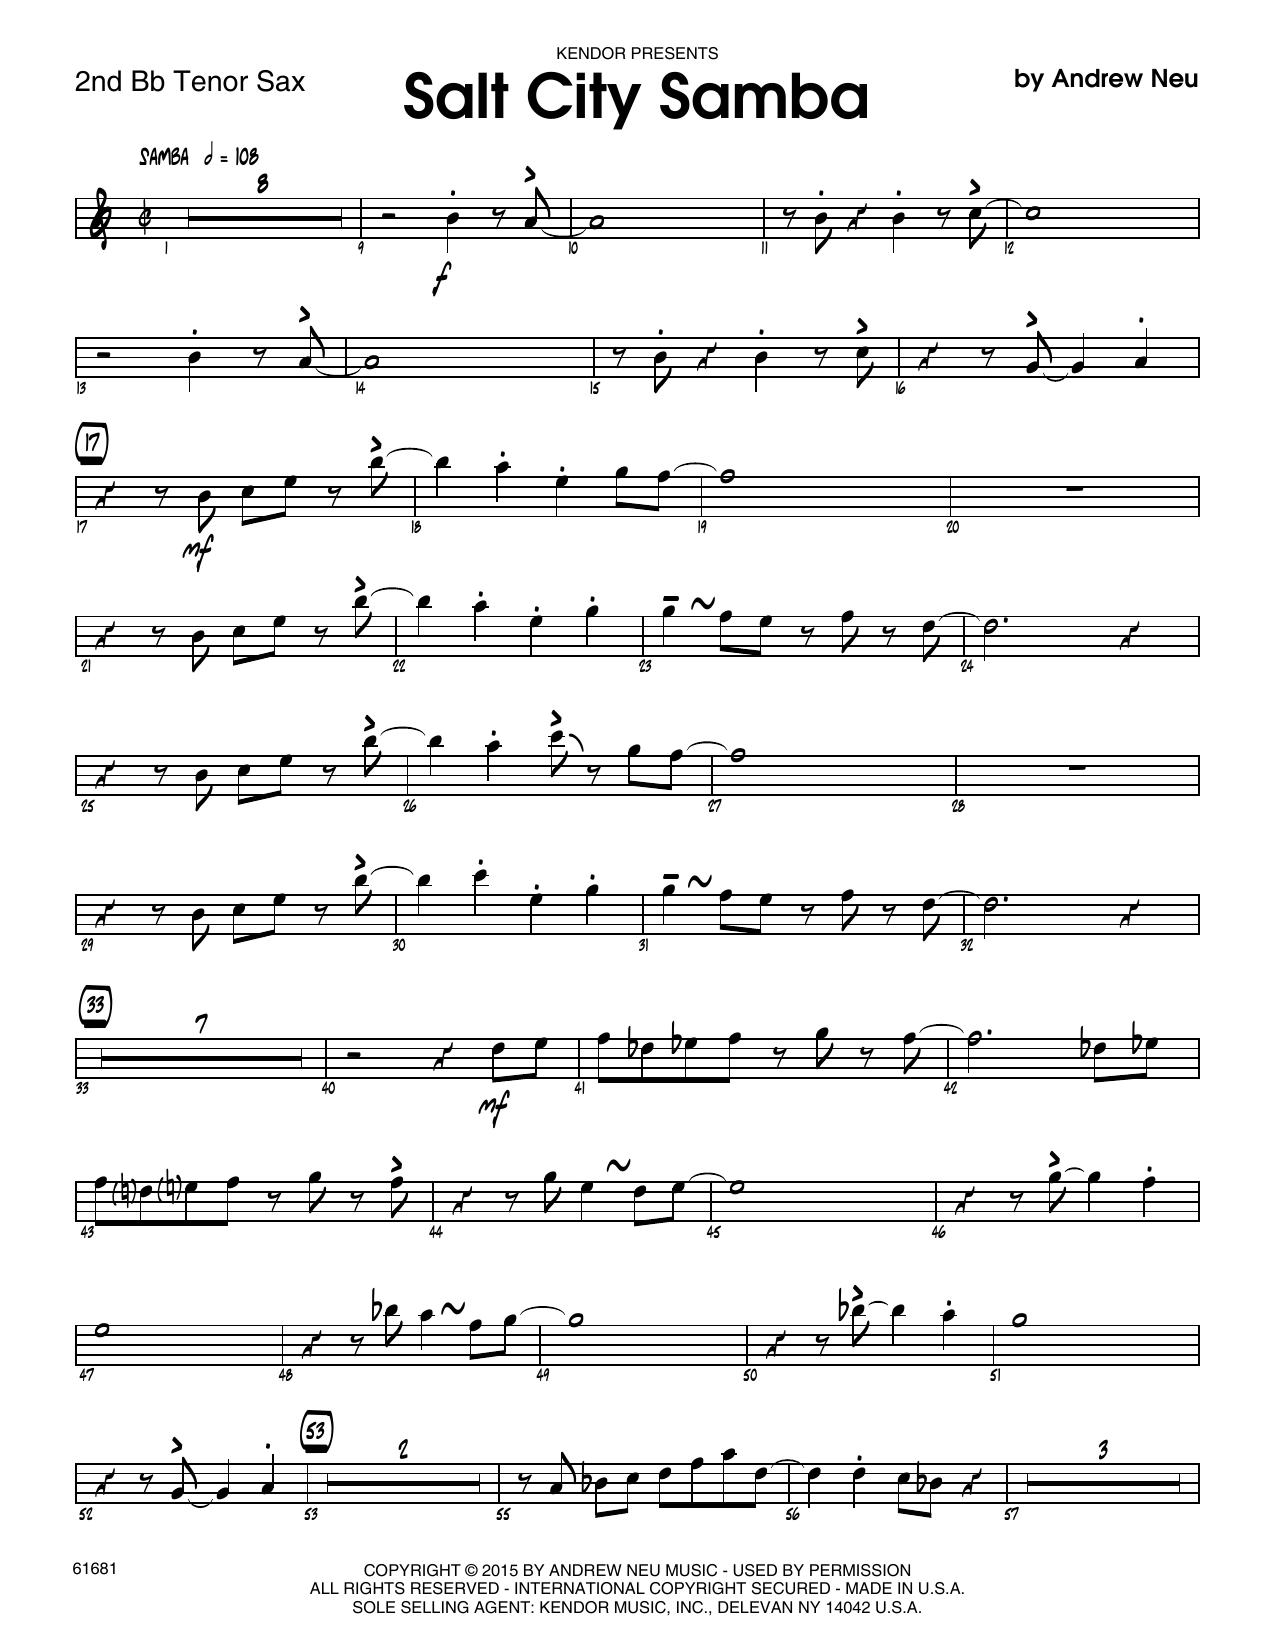 Salt City Samba - 2nd Bb Tenor Saxophone